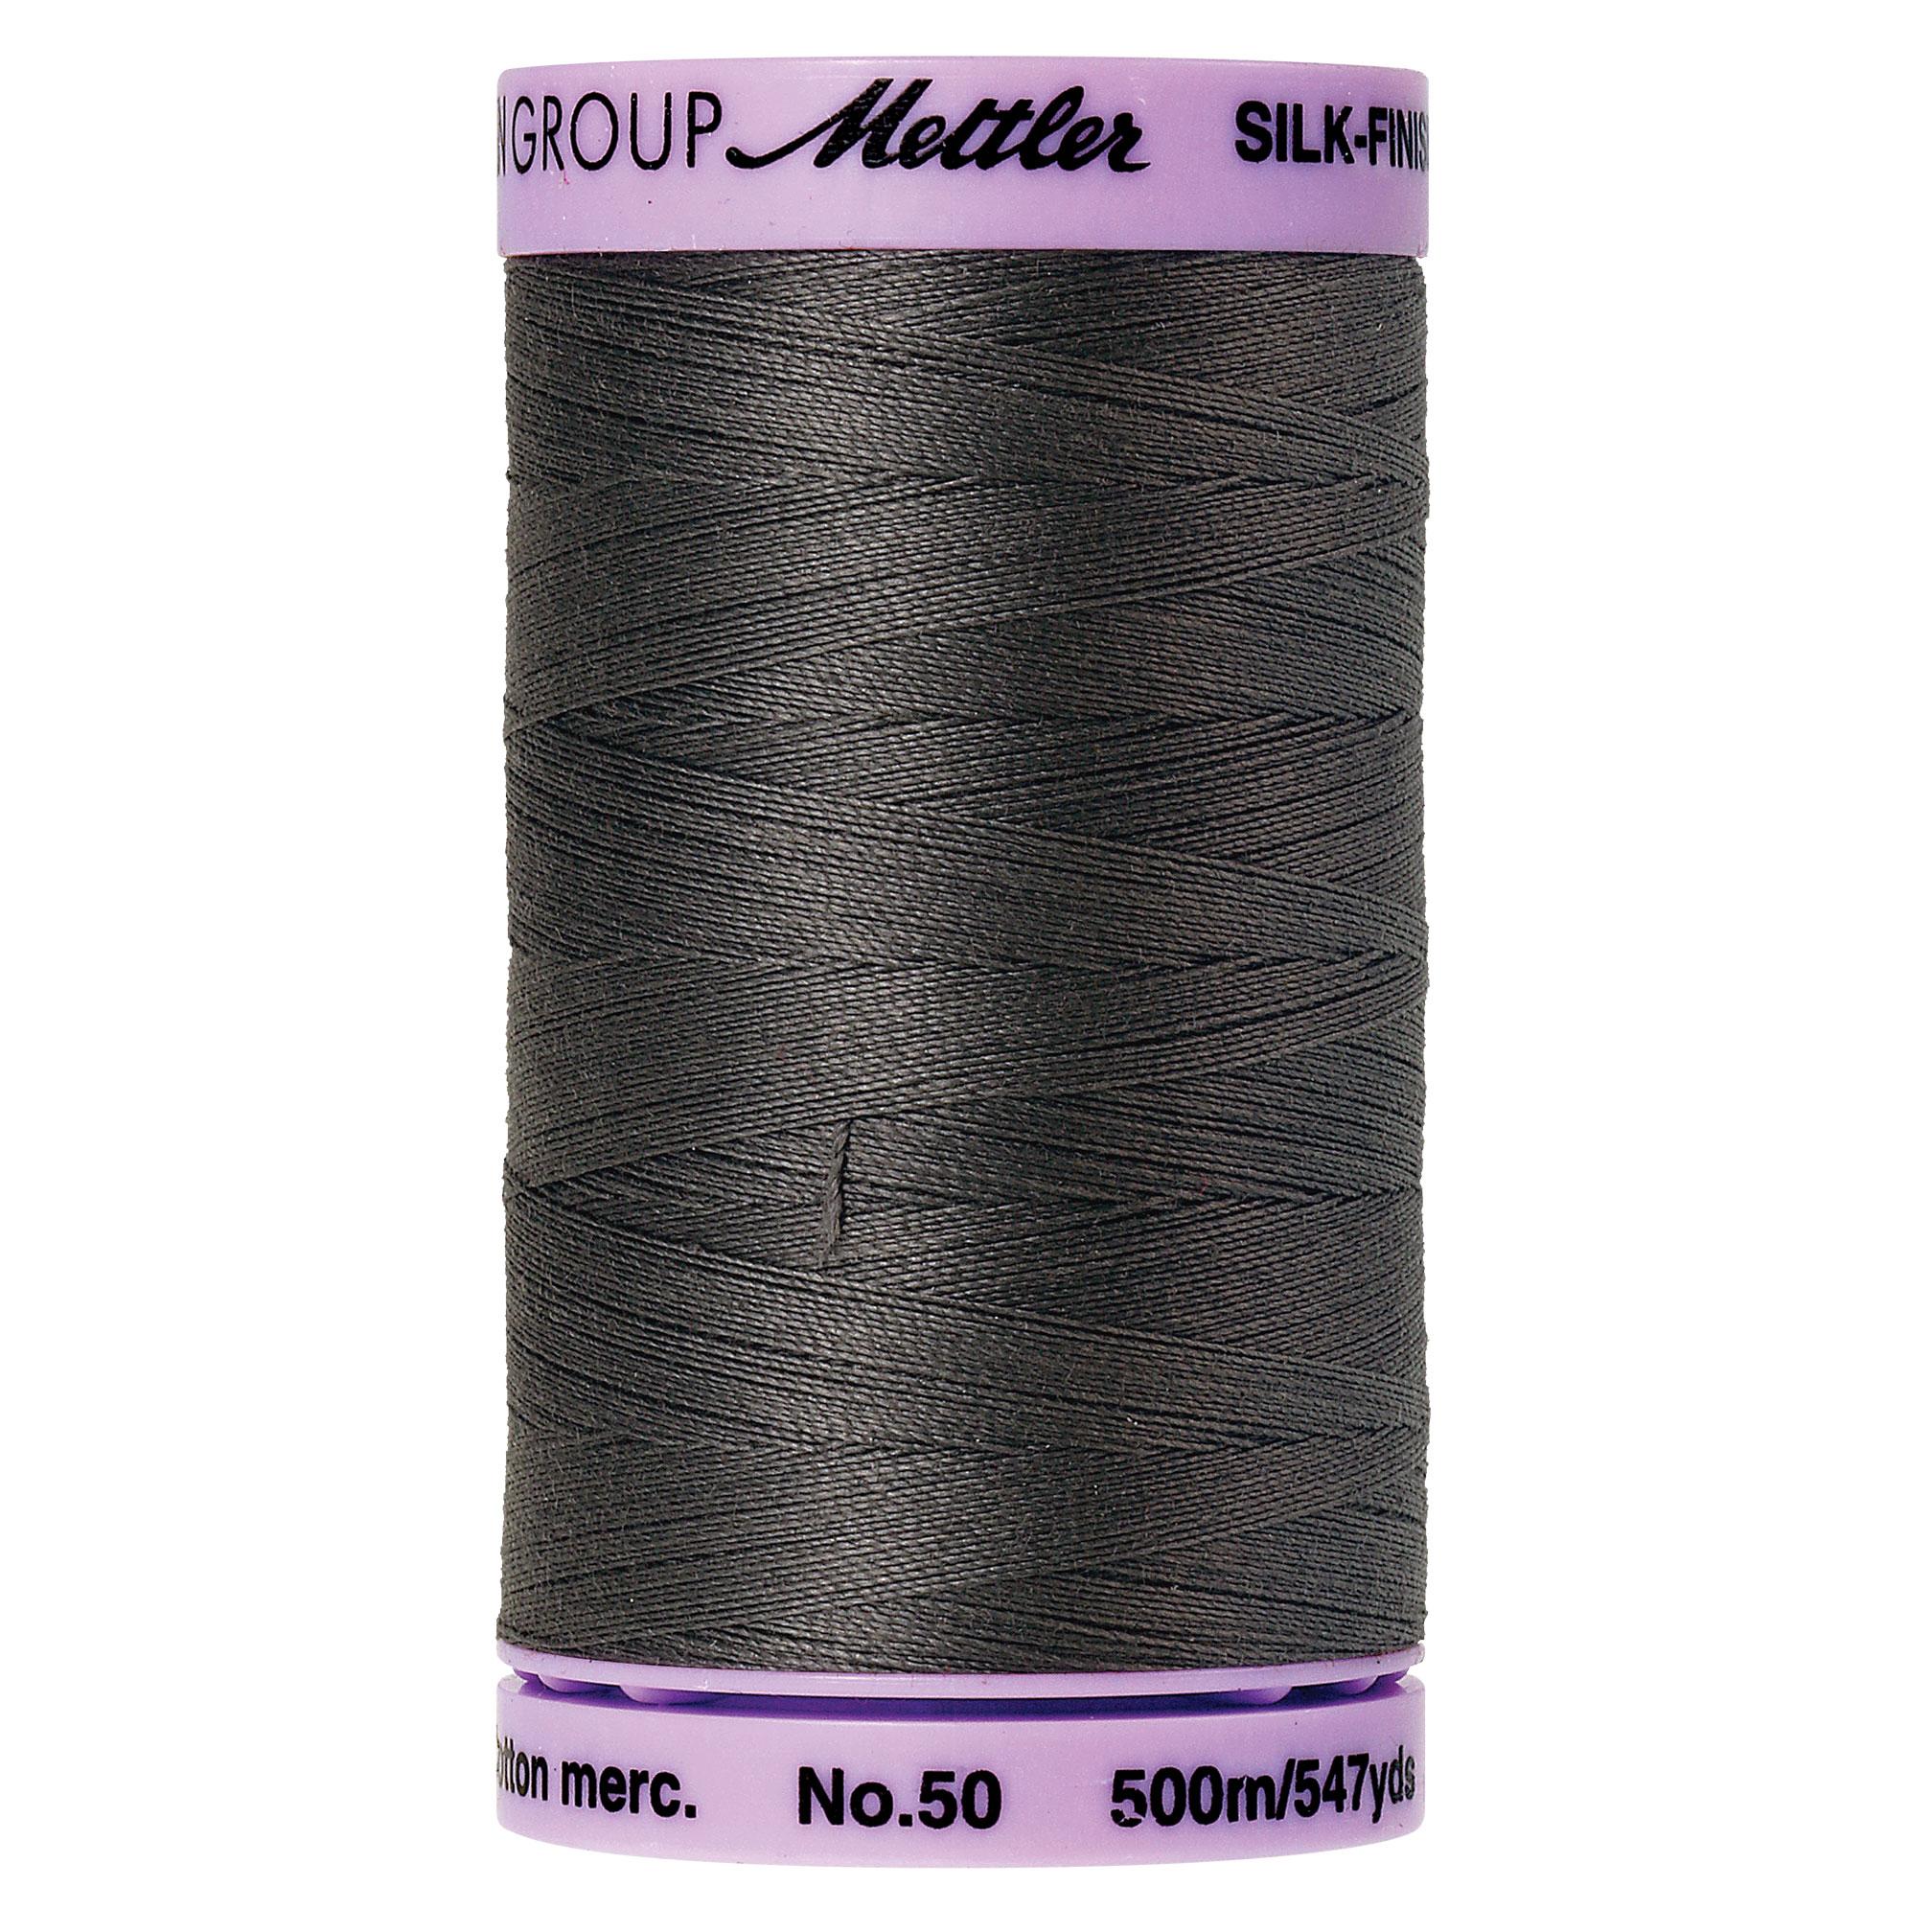 Mettler Silk-Finish 50wt Cotton Thread 547yd.  9104-0416